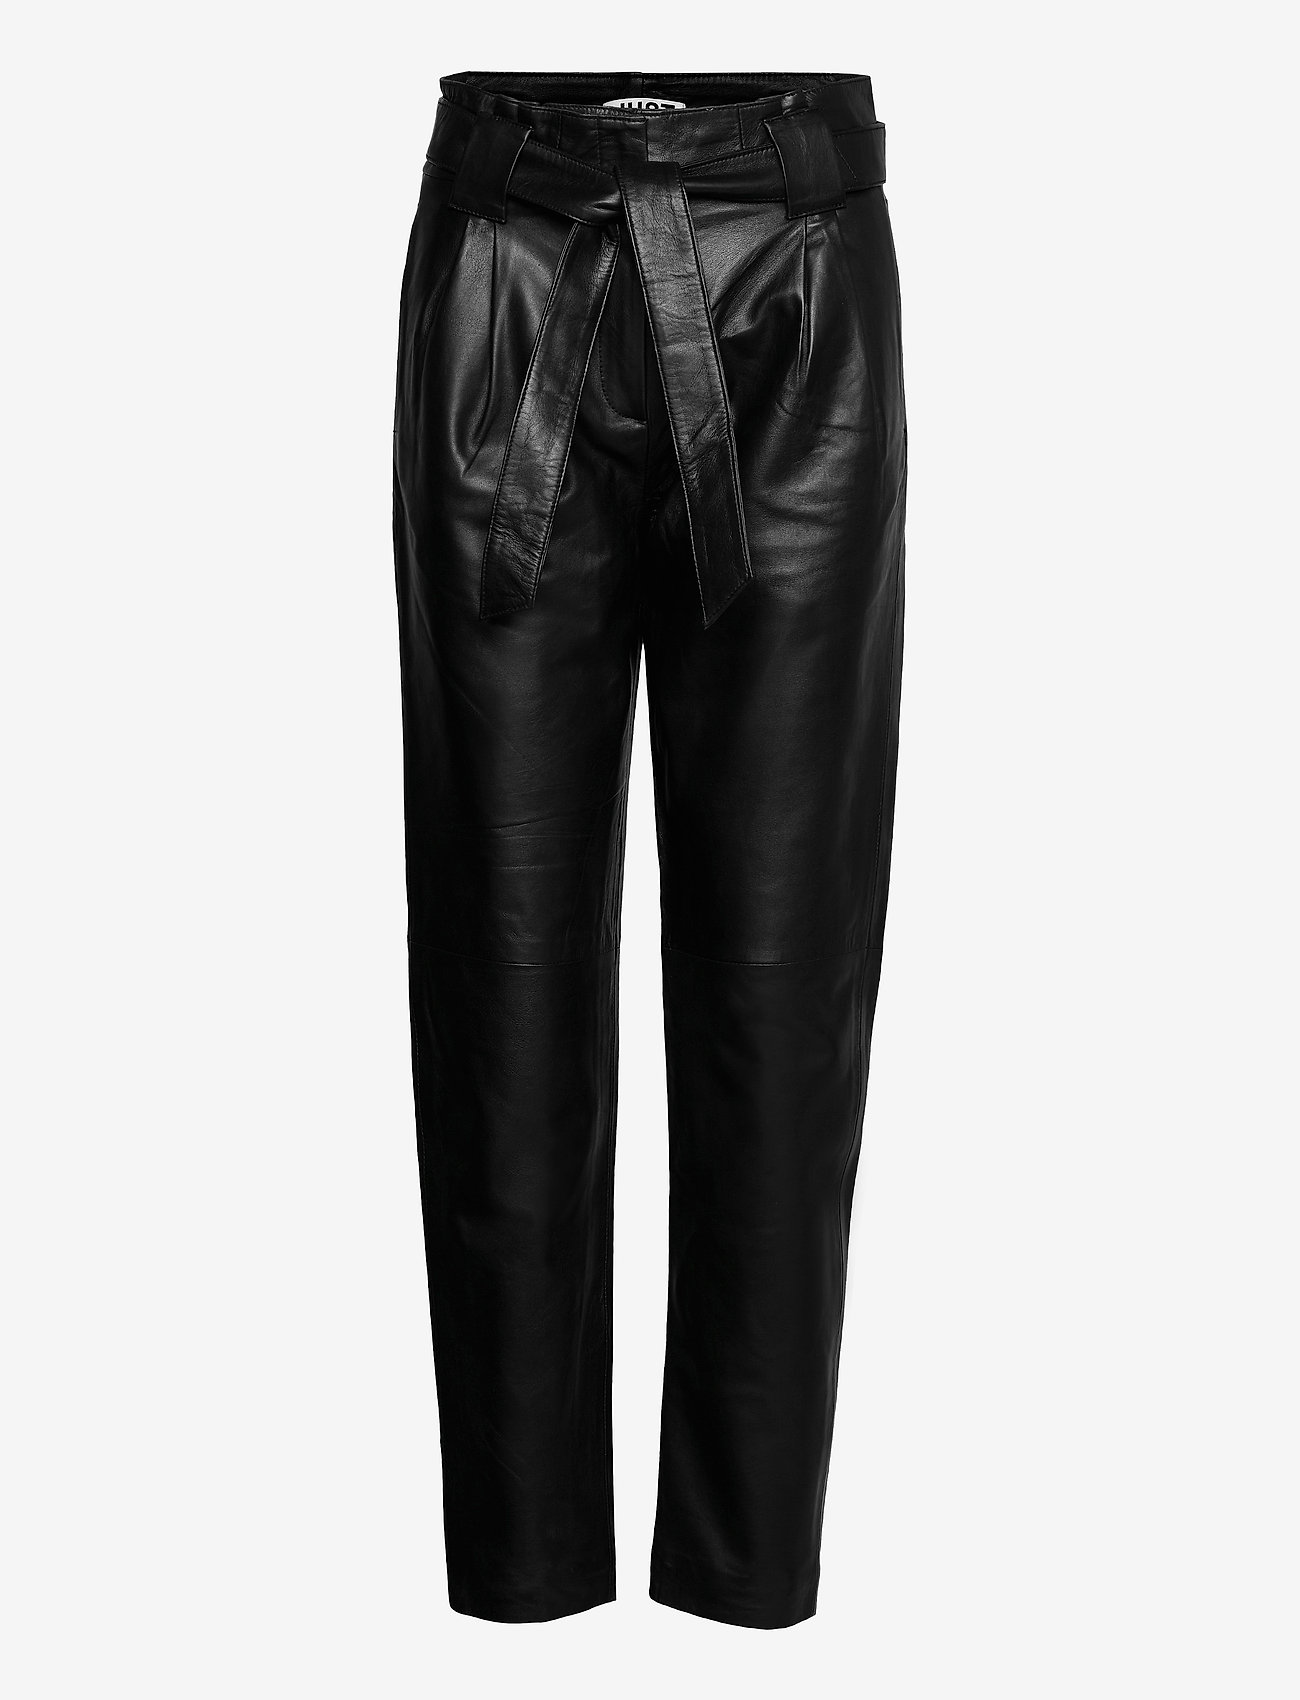 Just Female - Nago leather trousers - læderbukser - black - 0